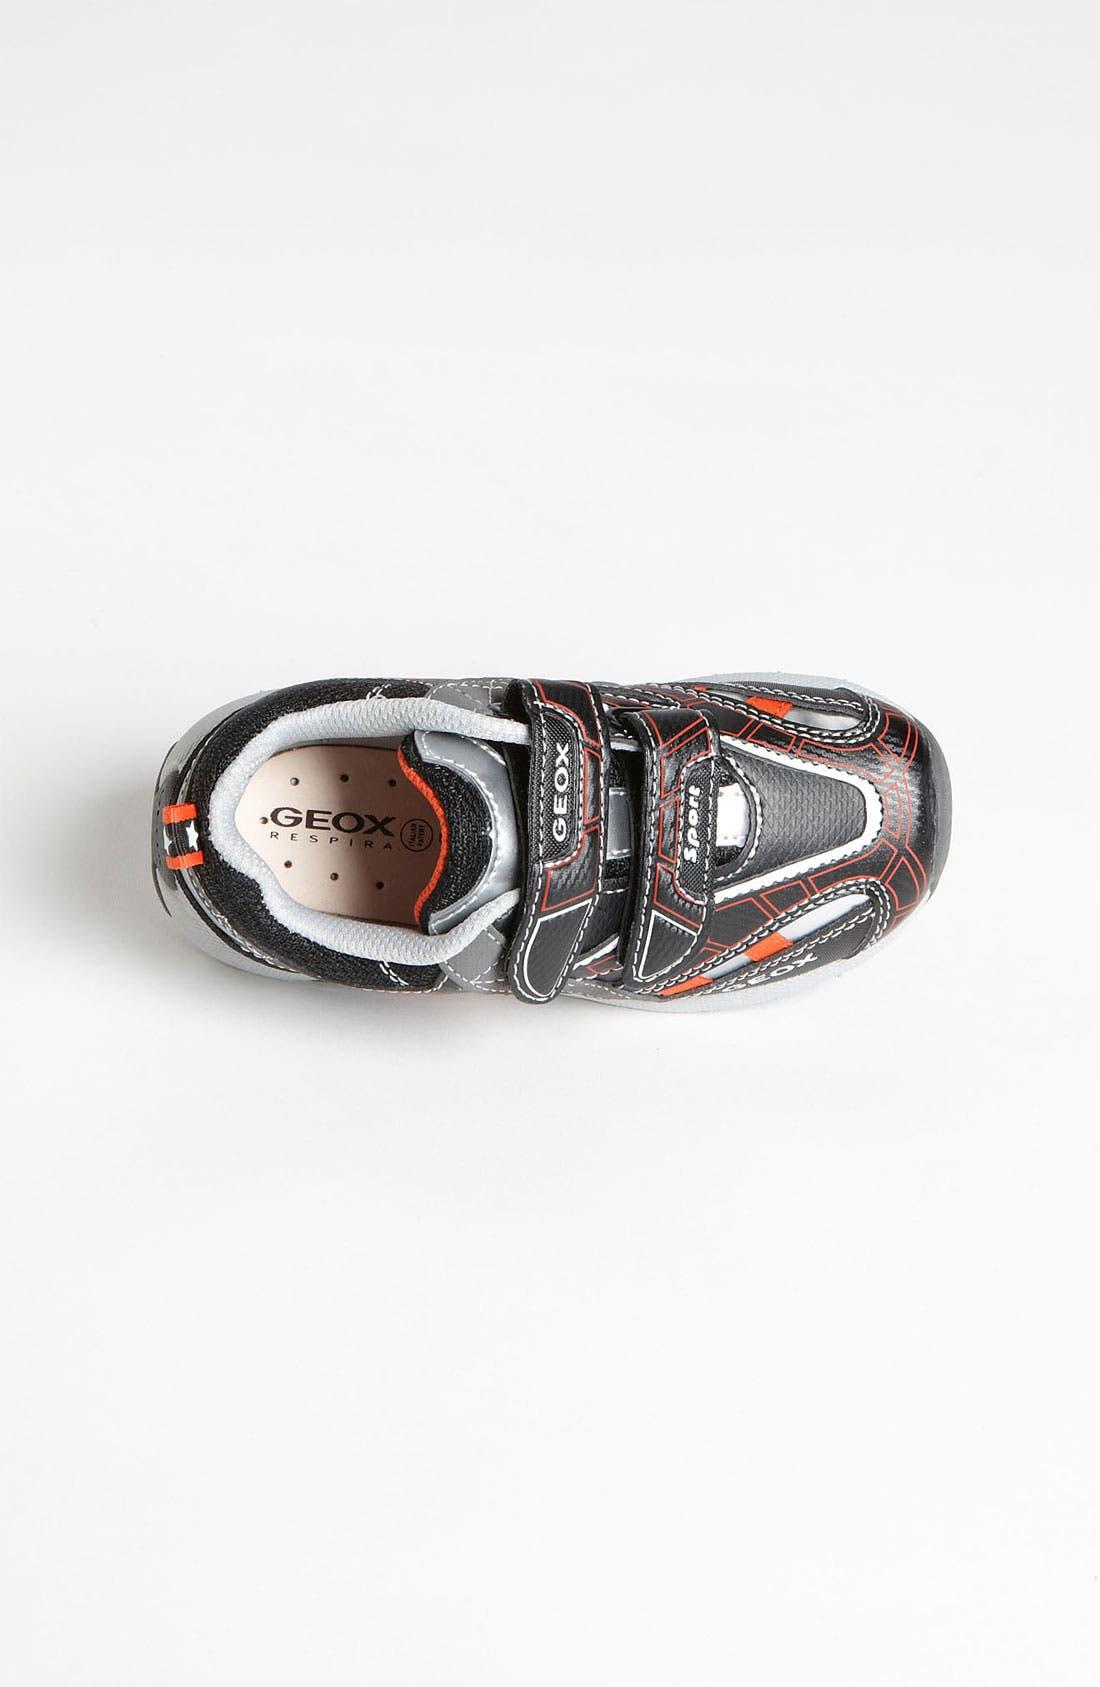 Alternate Image 3  - Geox 'Stark' Sneaker (Walker & Toddler)